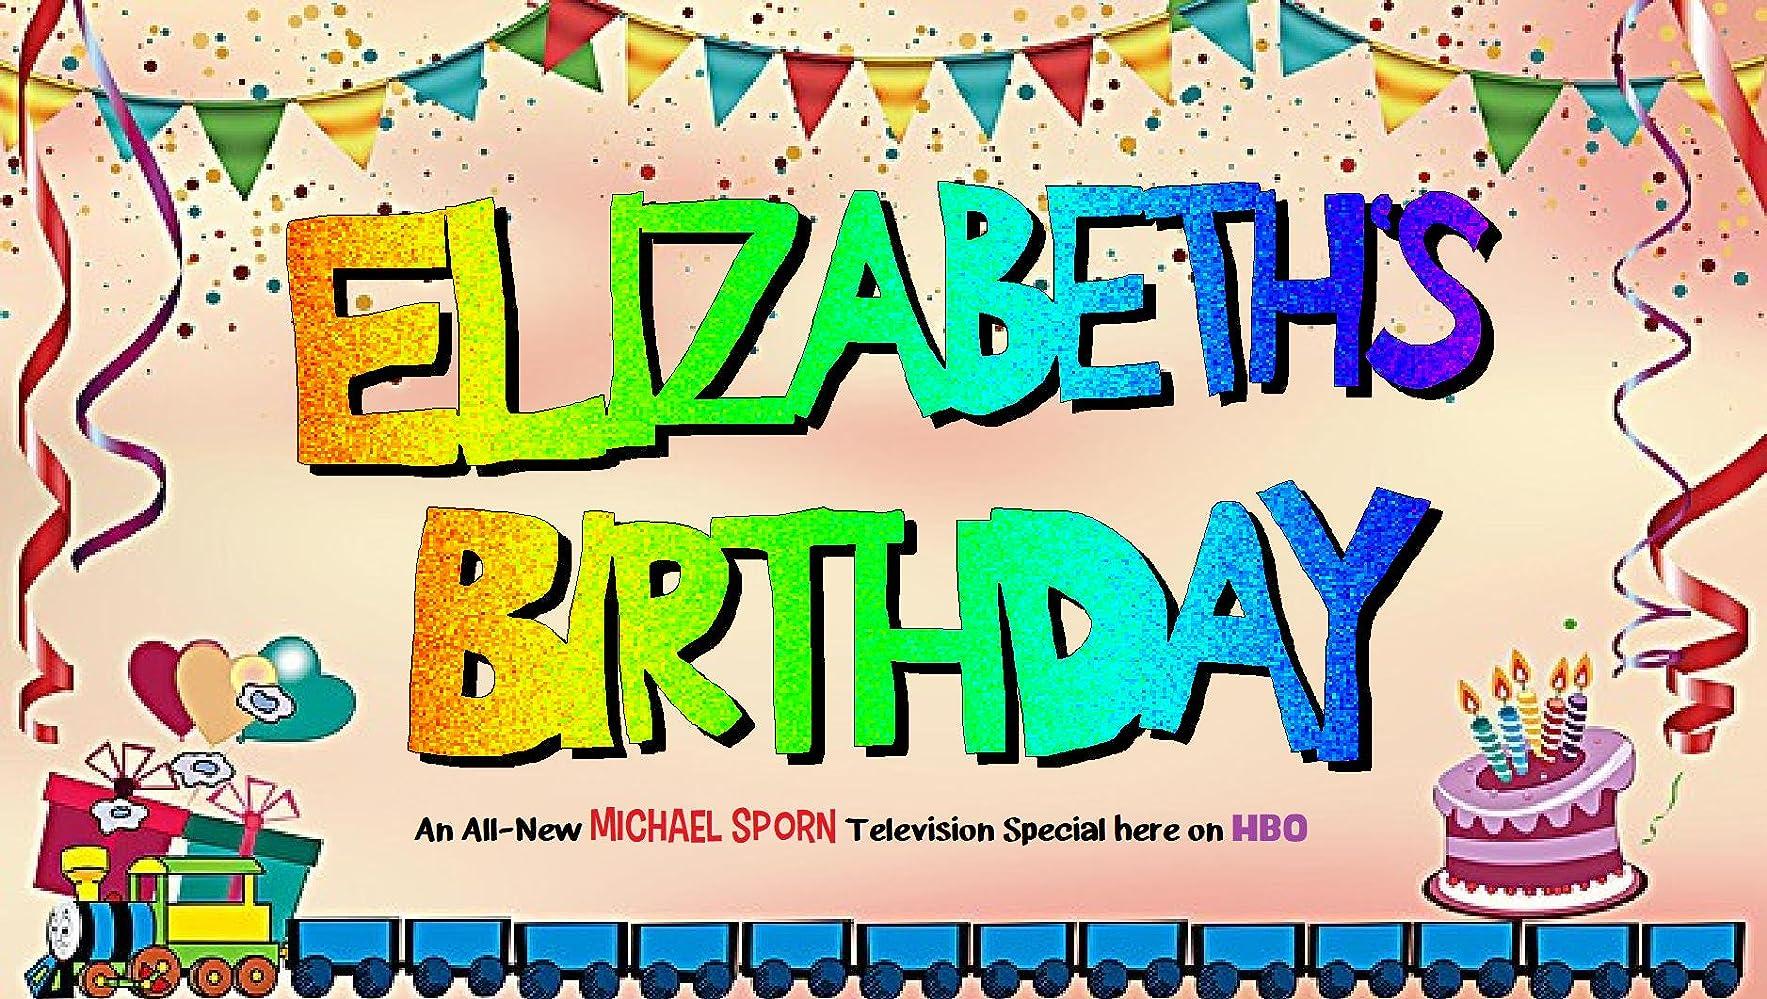 Earthday Birthday 1990